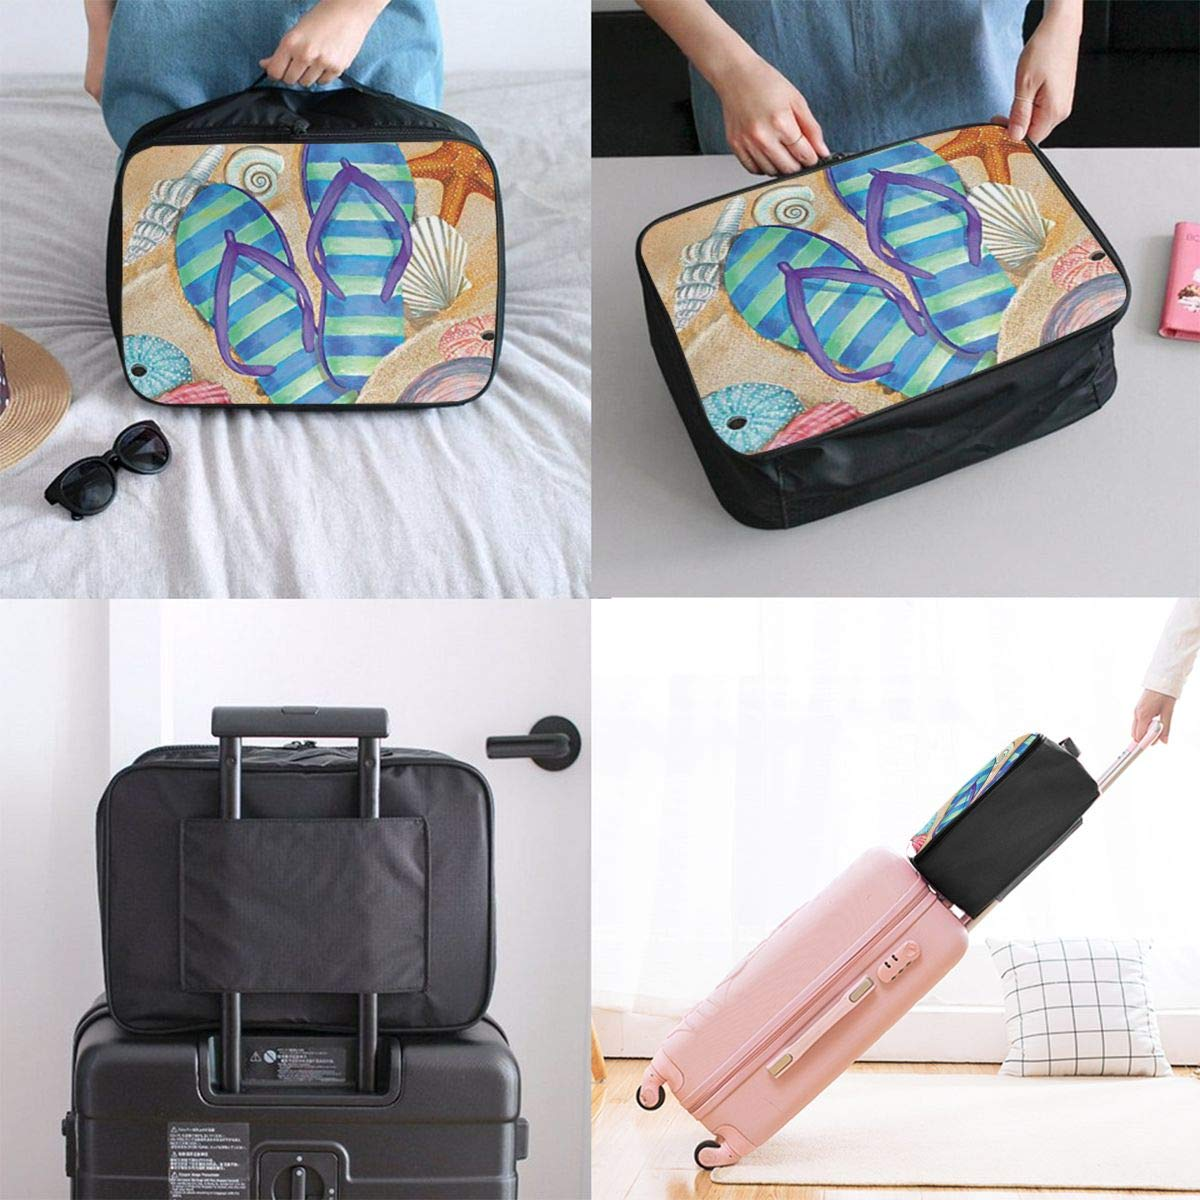 ADGAI Summer Flip-Flops Canvas Travel Weekender Bag,Fashion Custom Lightweight Large Capacity Portable Luggage Bag,Suitcase Trolley Bag